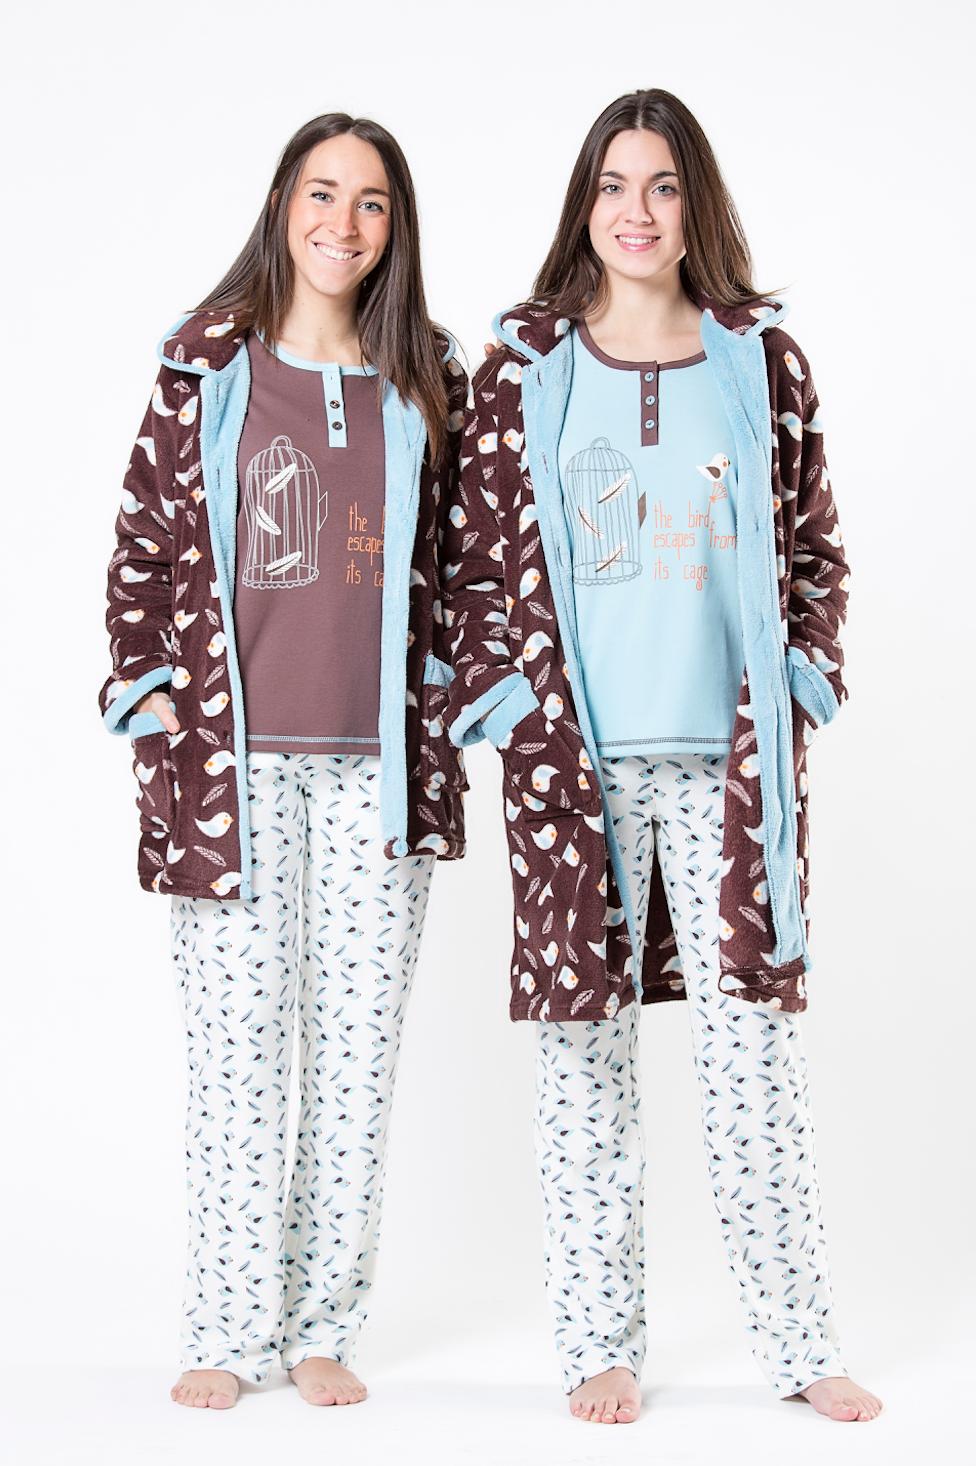 6fb5829f5436a diseño pijamas Cue pájaros woman mujer moda underwear noche bata fashion  Pyjamas